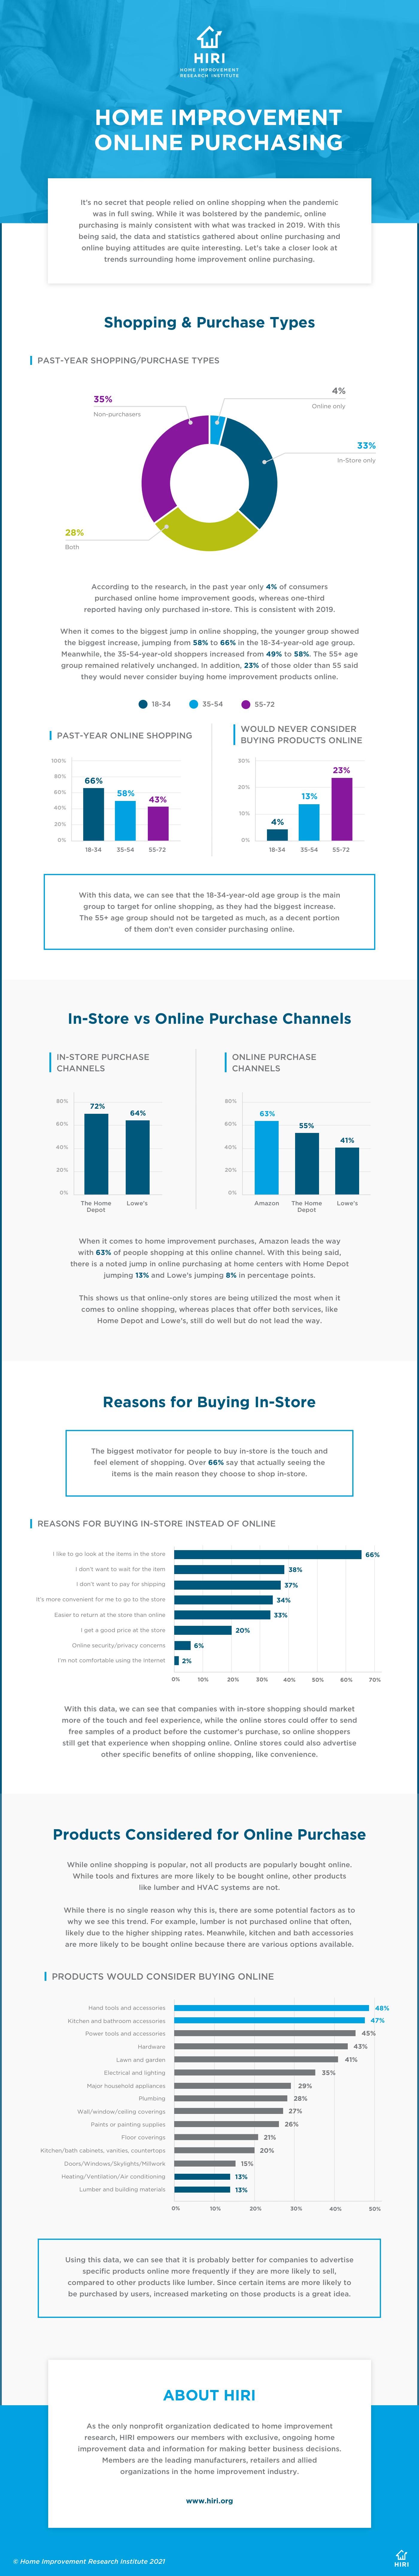 Home Improvement Online Purchasing